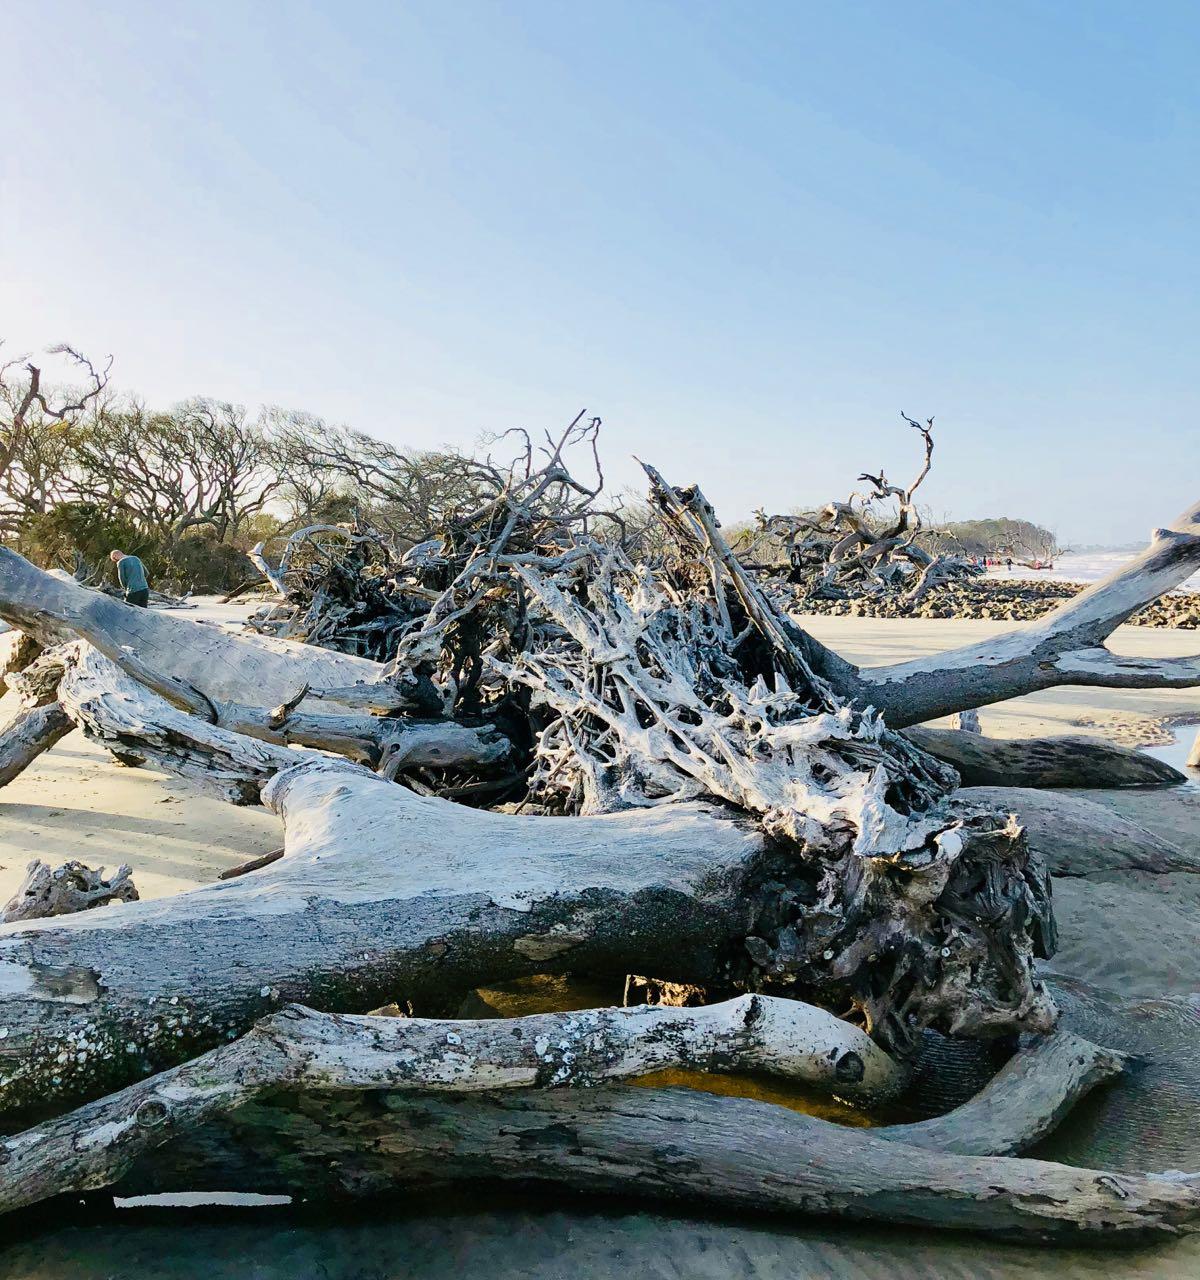 Jekyll island Driftwood beach bike trip